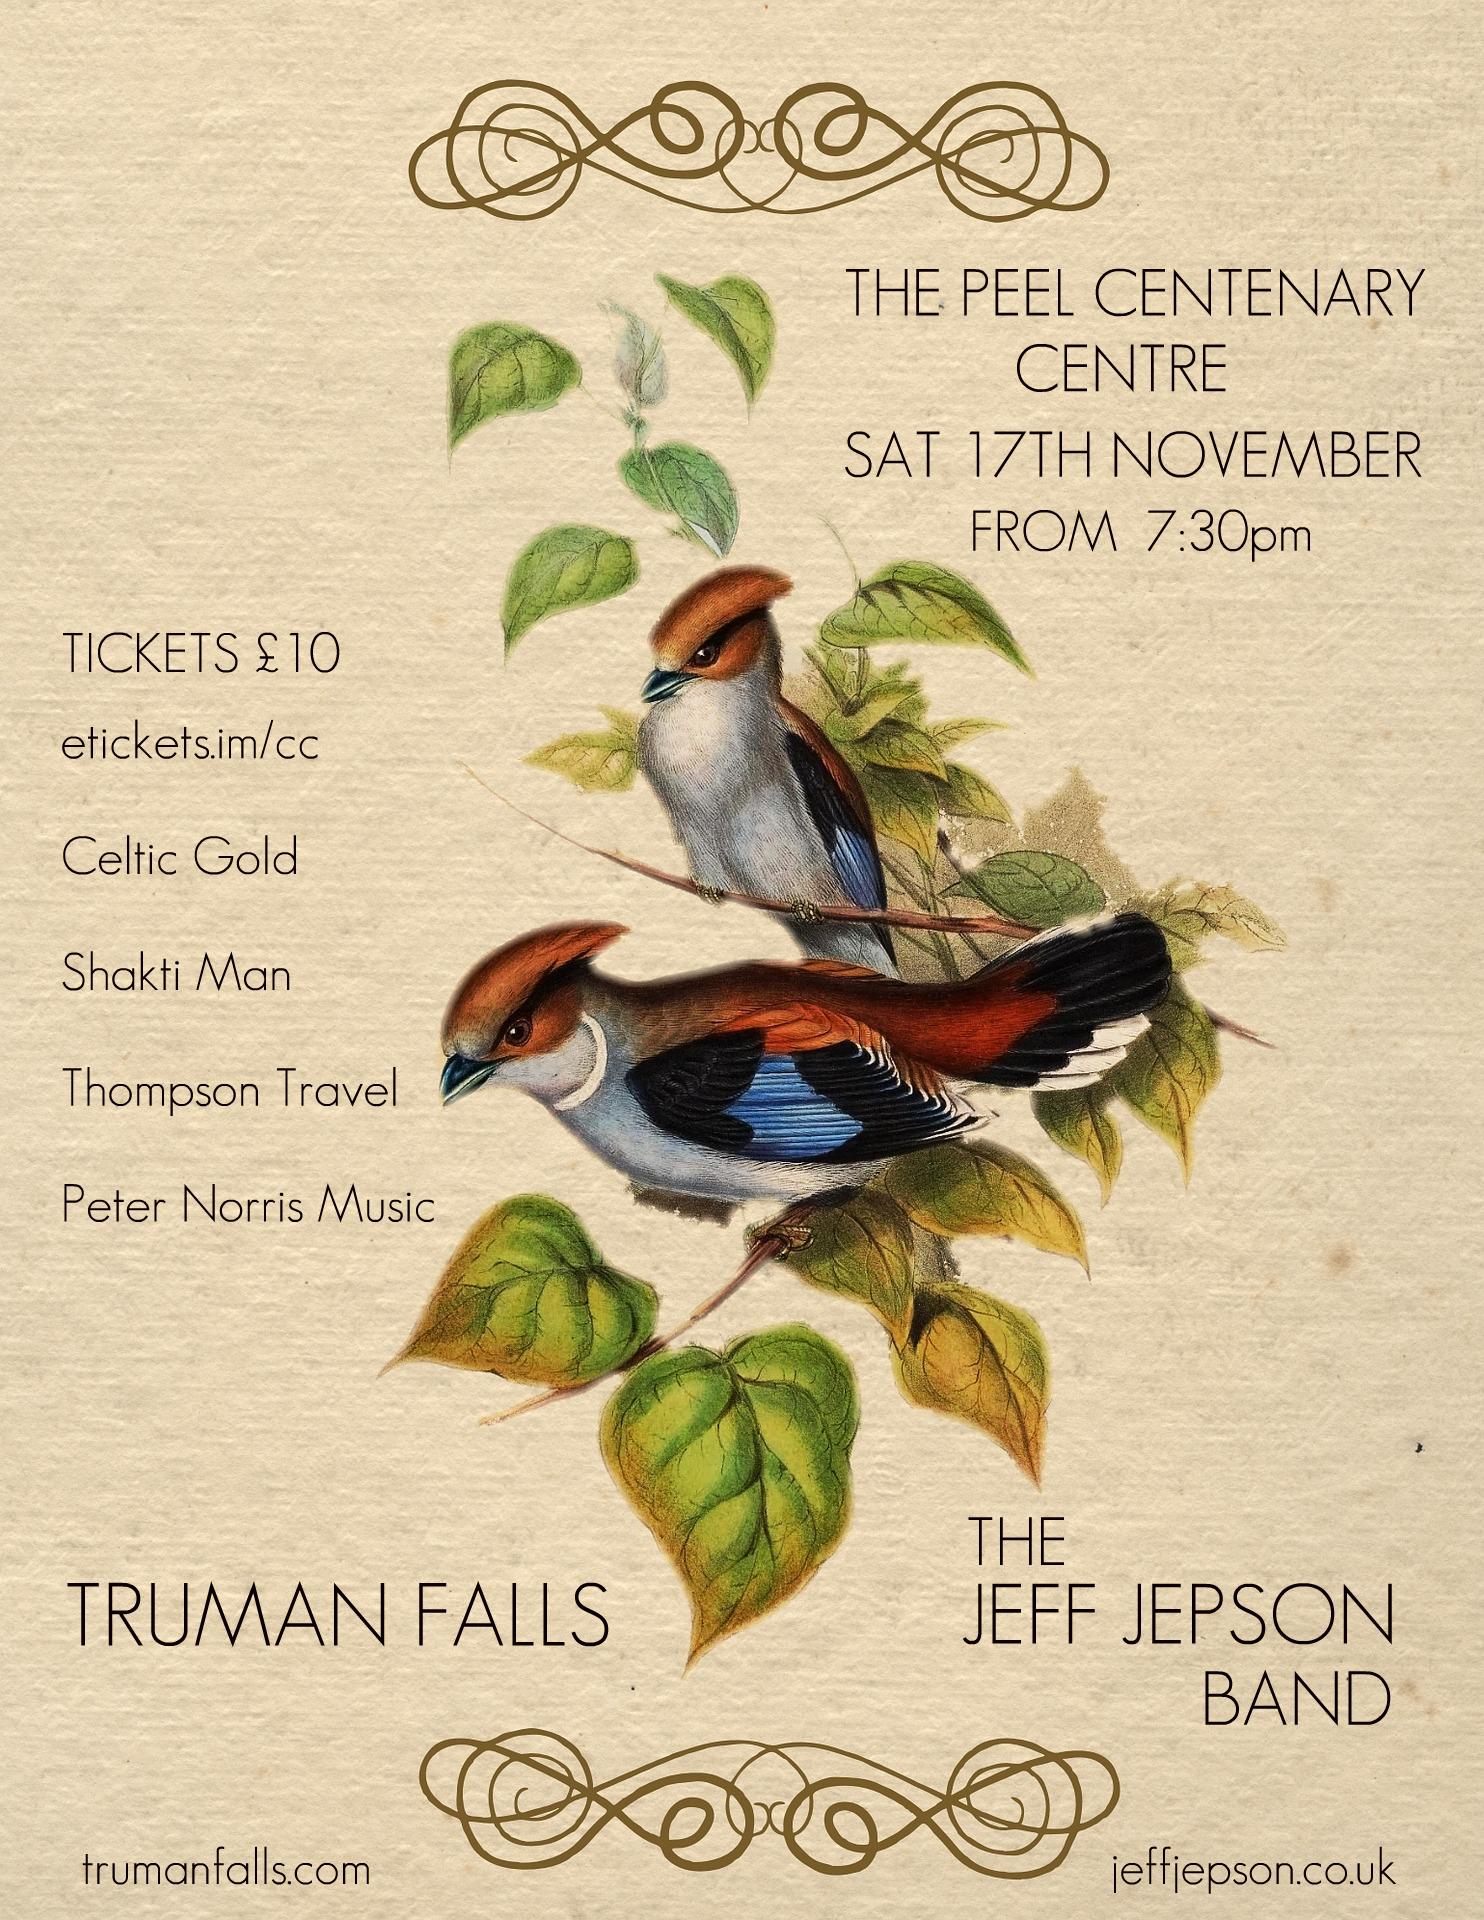 Truman Falls and The Jeff Jepson Band @ Peel Centenary Centre | Peel | Isle of Man